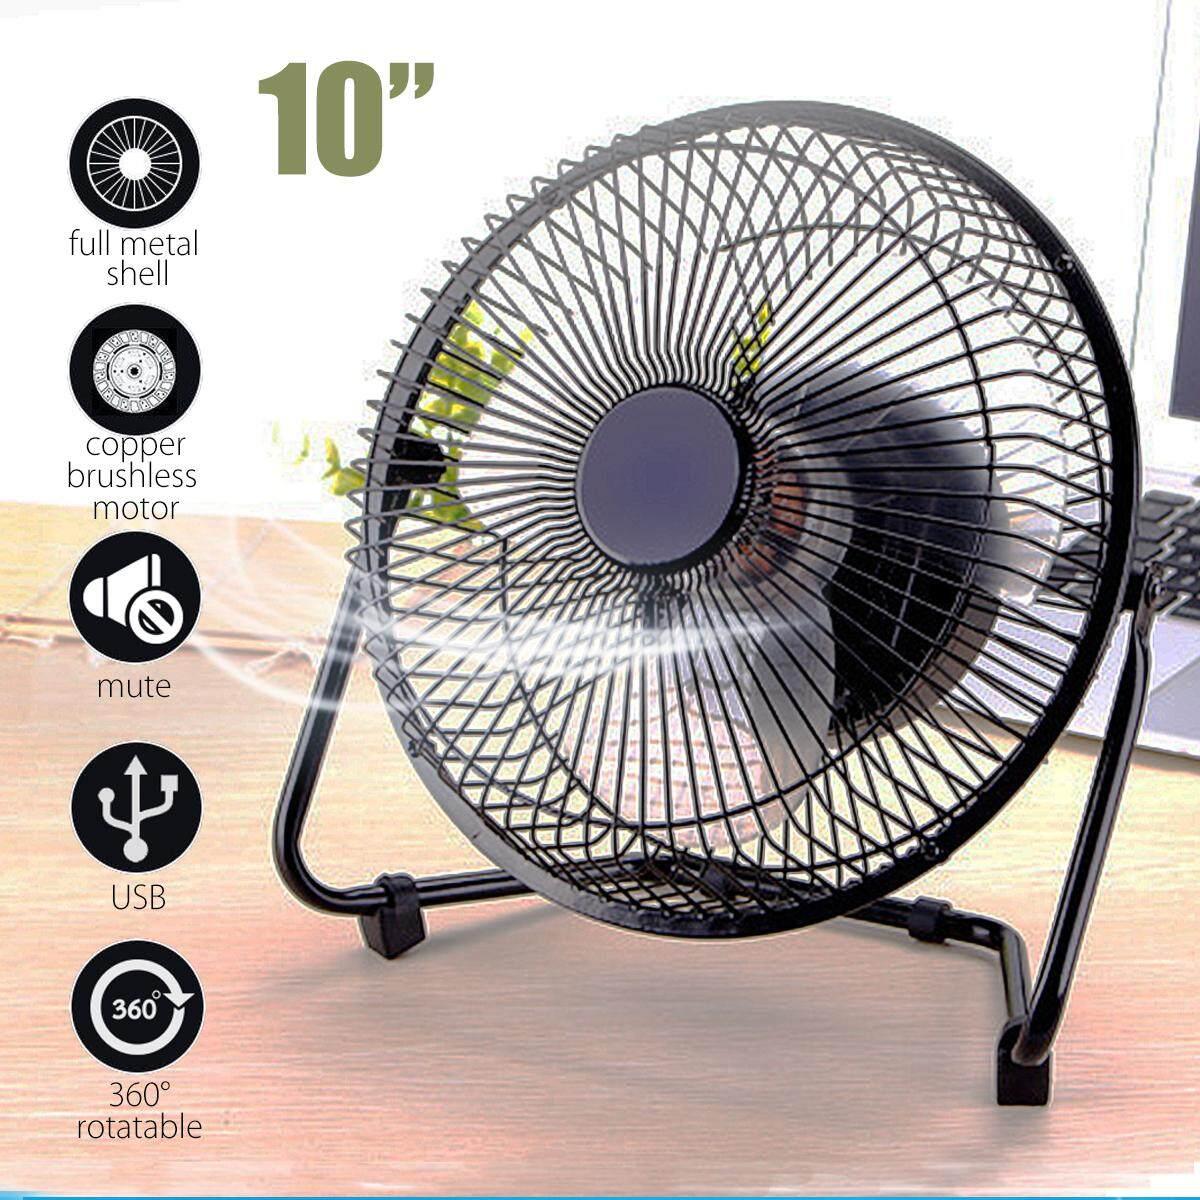 10 Metal Adjustable 360° Rotatable USB Fan Rechargeable Battery Desk Cooler - intl